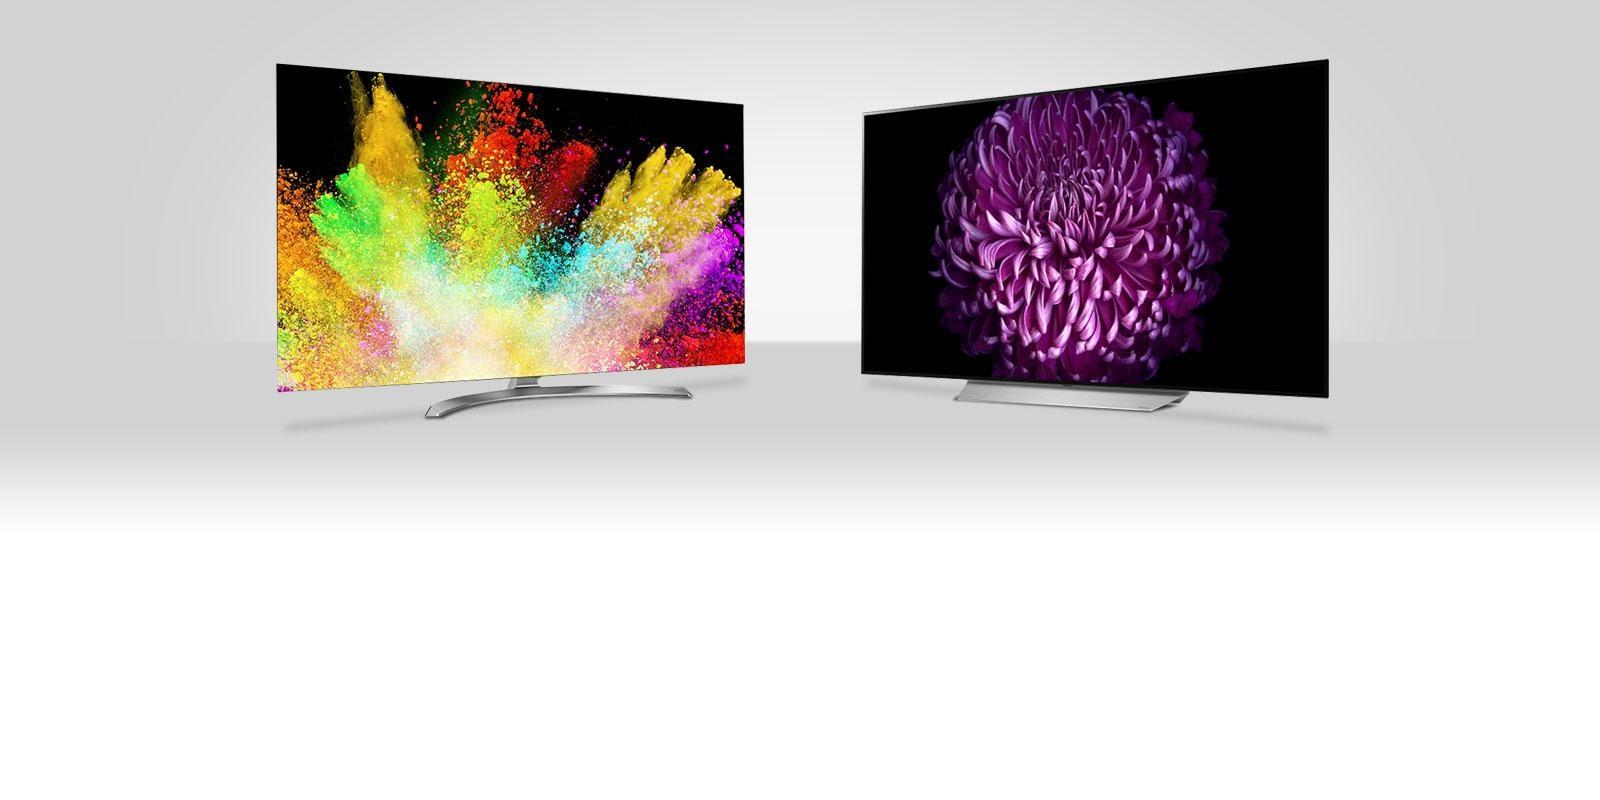 3D TVs: Compare LG\u0027s 3D 4K, Smart \u0026 OLED TVs | LG USA